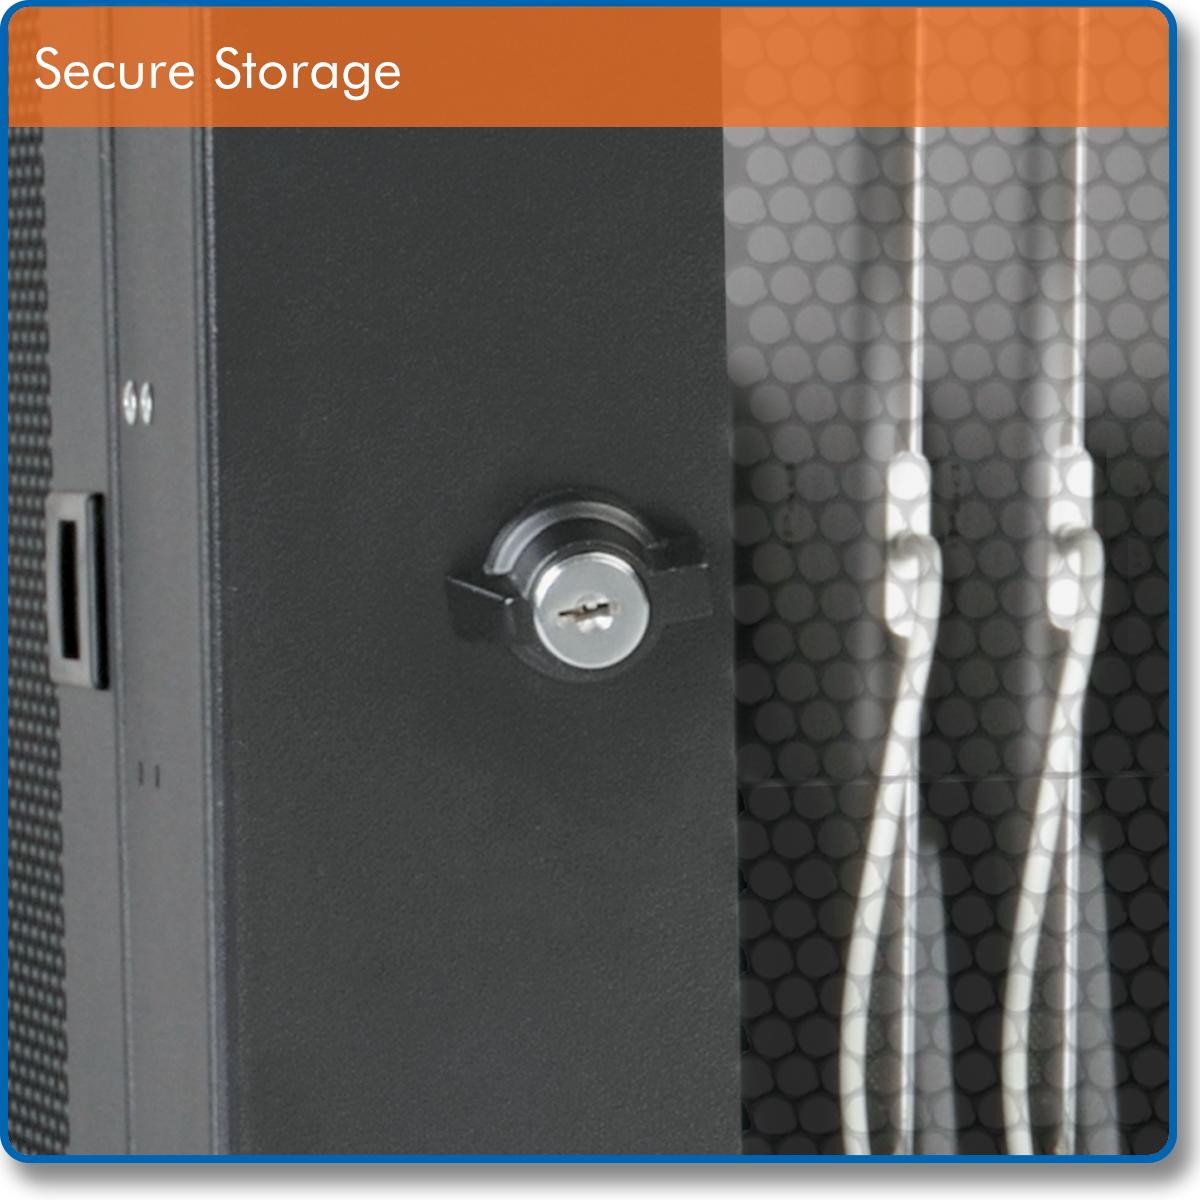 Amazon.com: Tripp Lite 16-Port AC Charging Storage Station